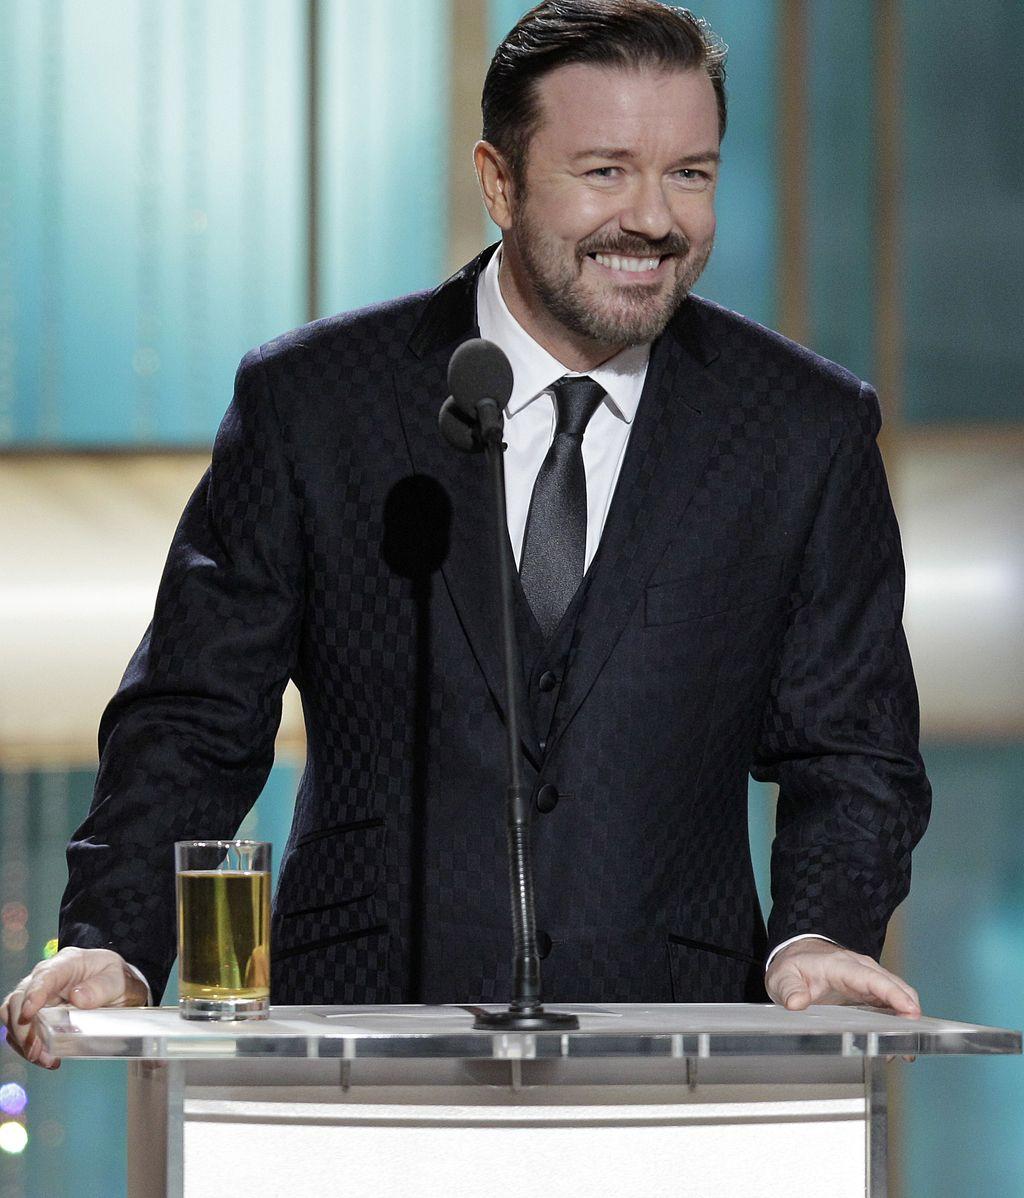 Ricky Gervais presentando una gala